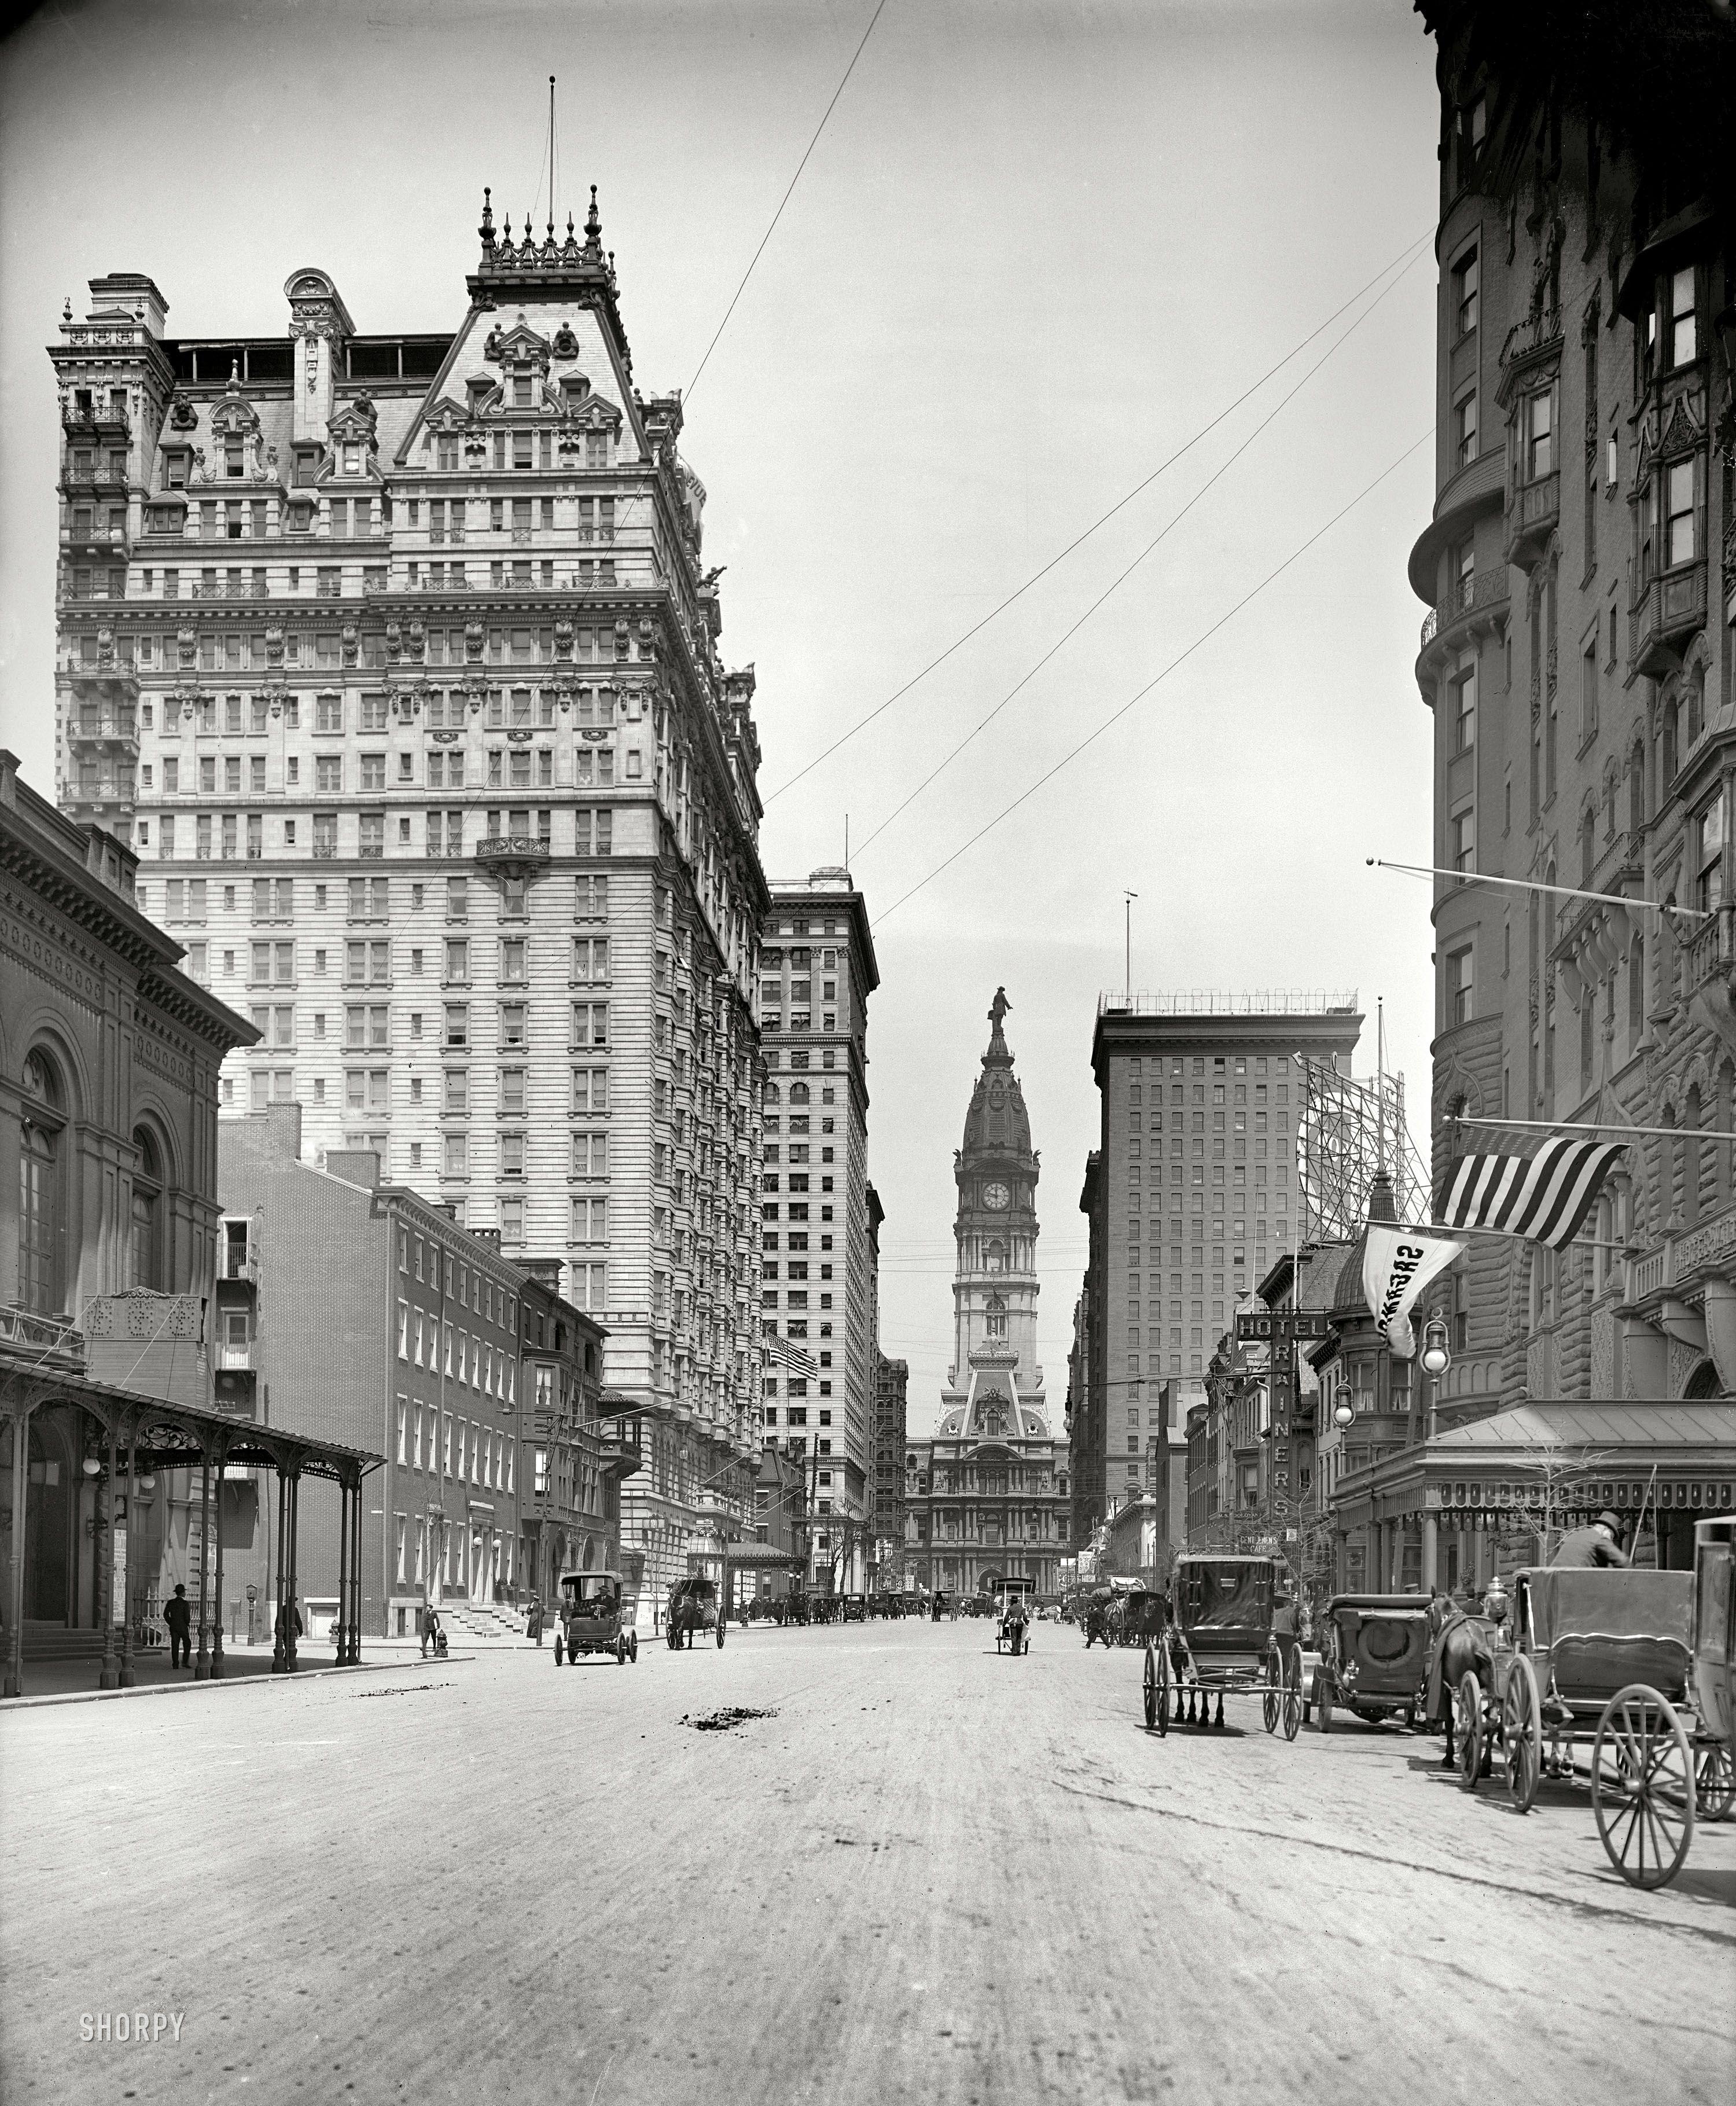 Apologise, Broad street station philadelphia vintage photographs sorry